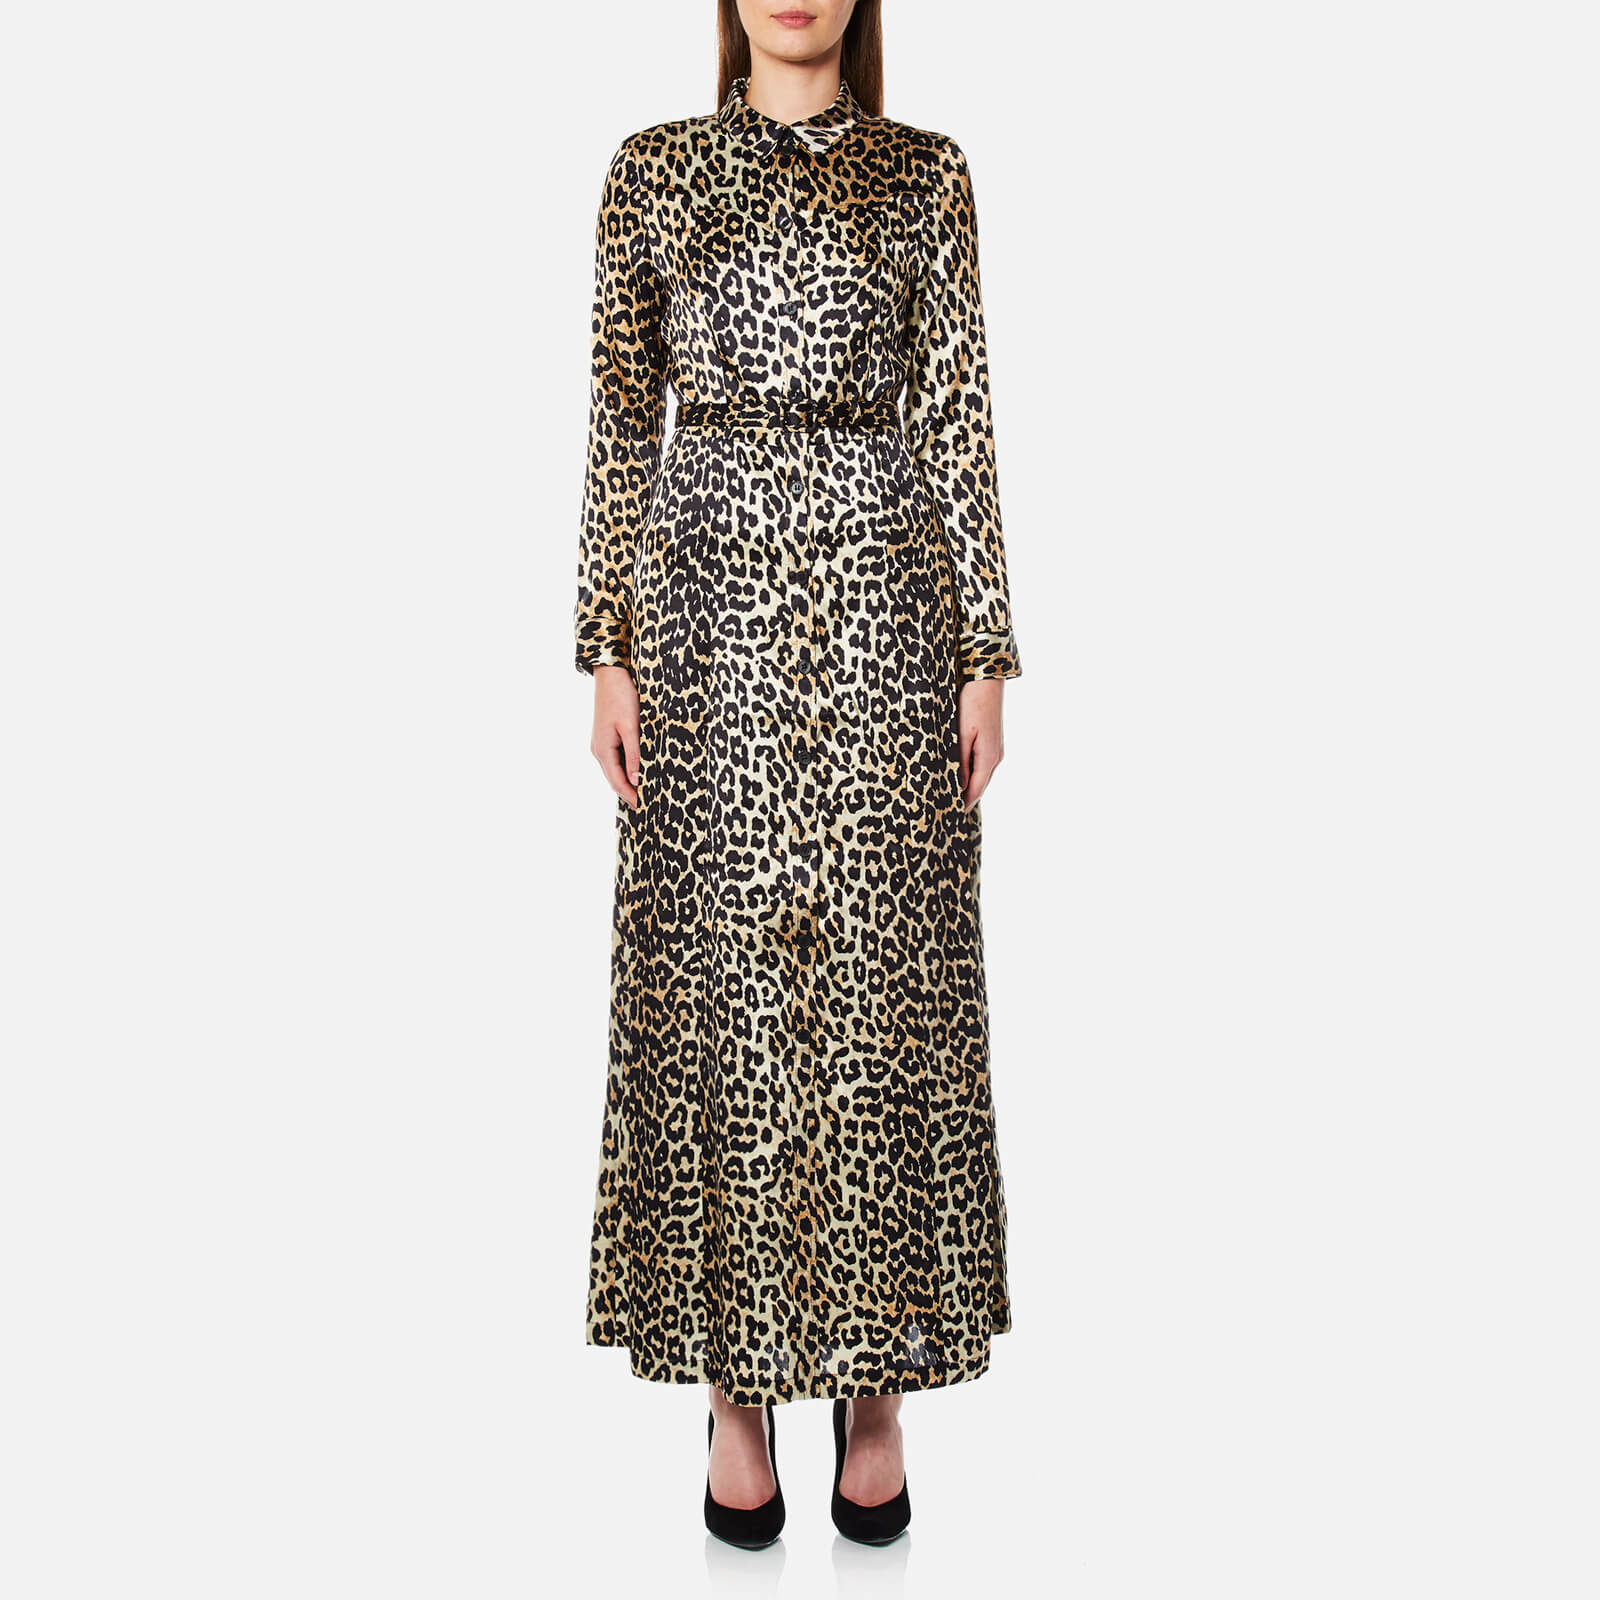 f22a37e9d92d Ganni Women's Dufort Silk Dress - Leopard - Free UK Delivery over £50